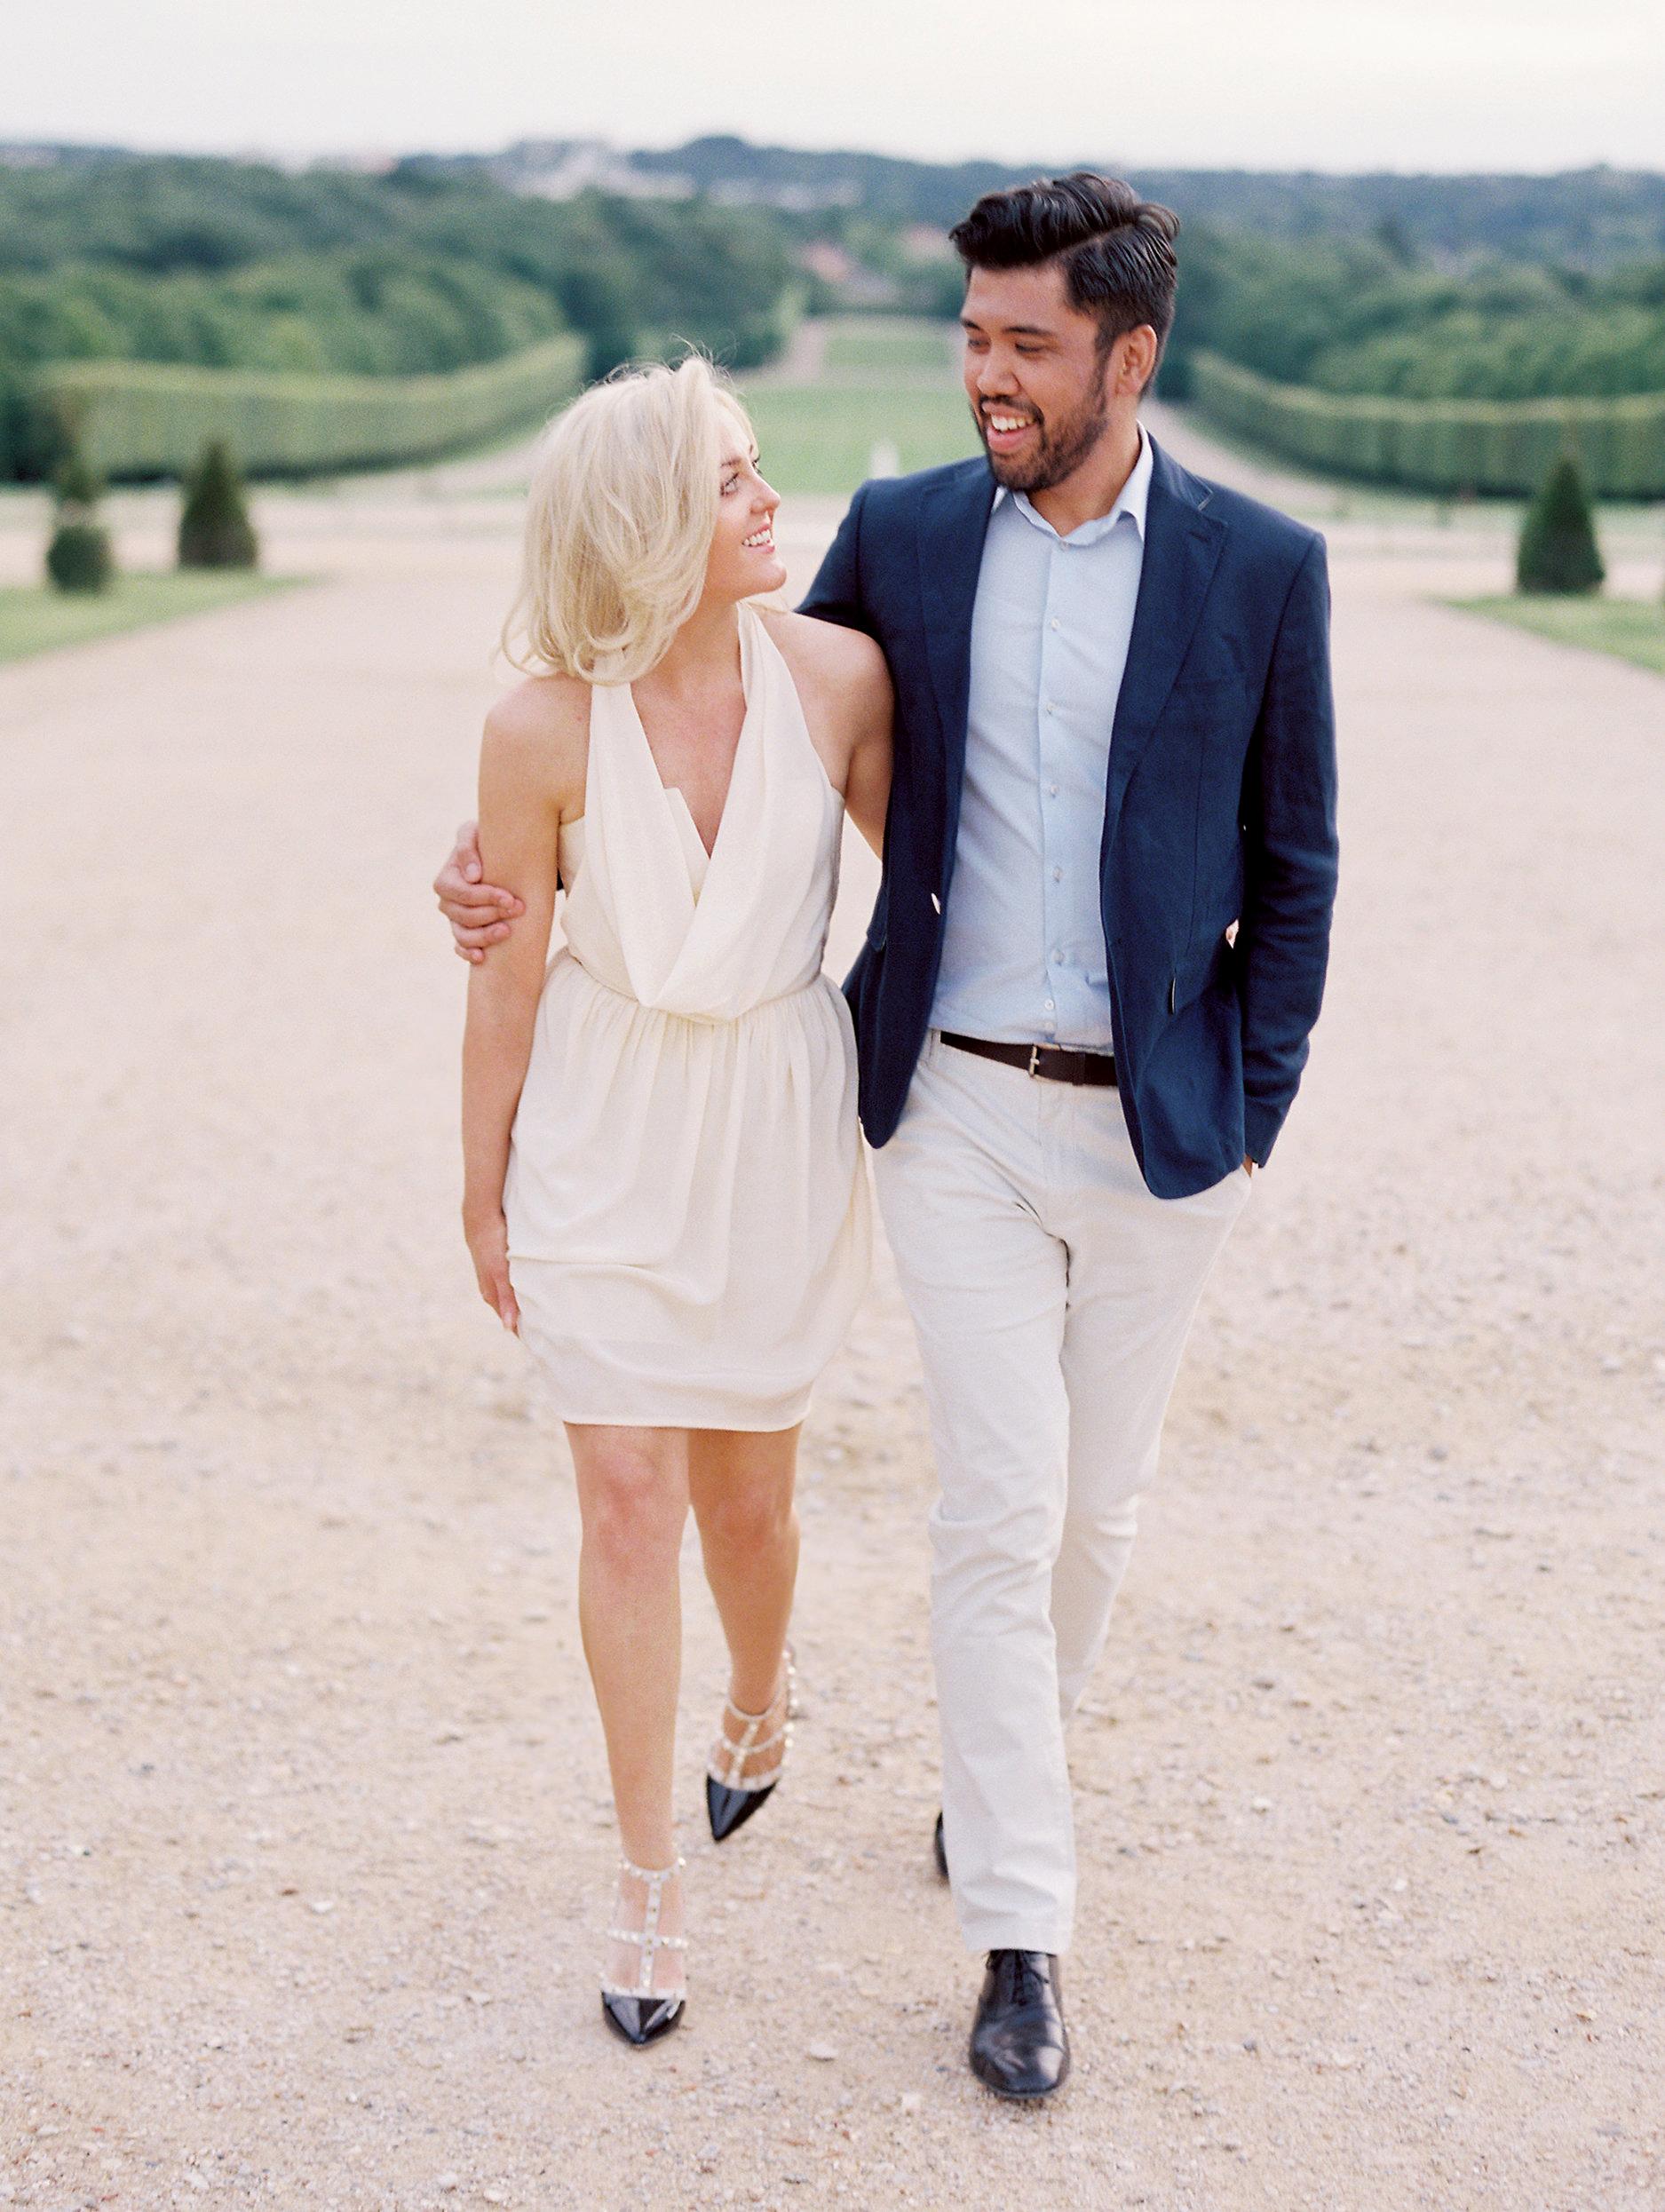 engaged couple walking outdoors